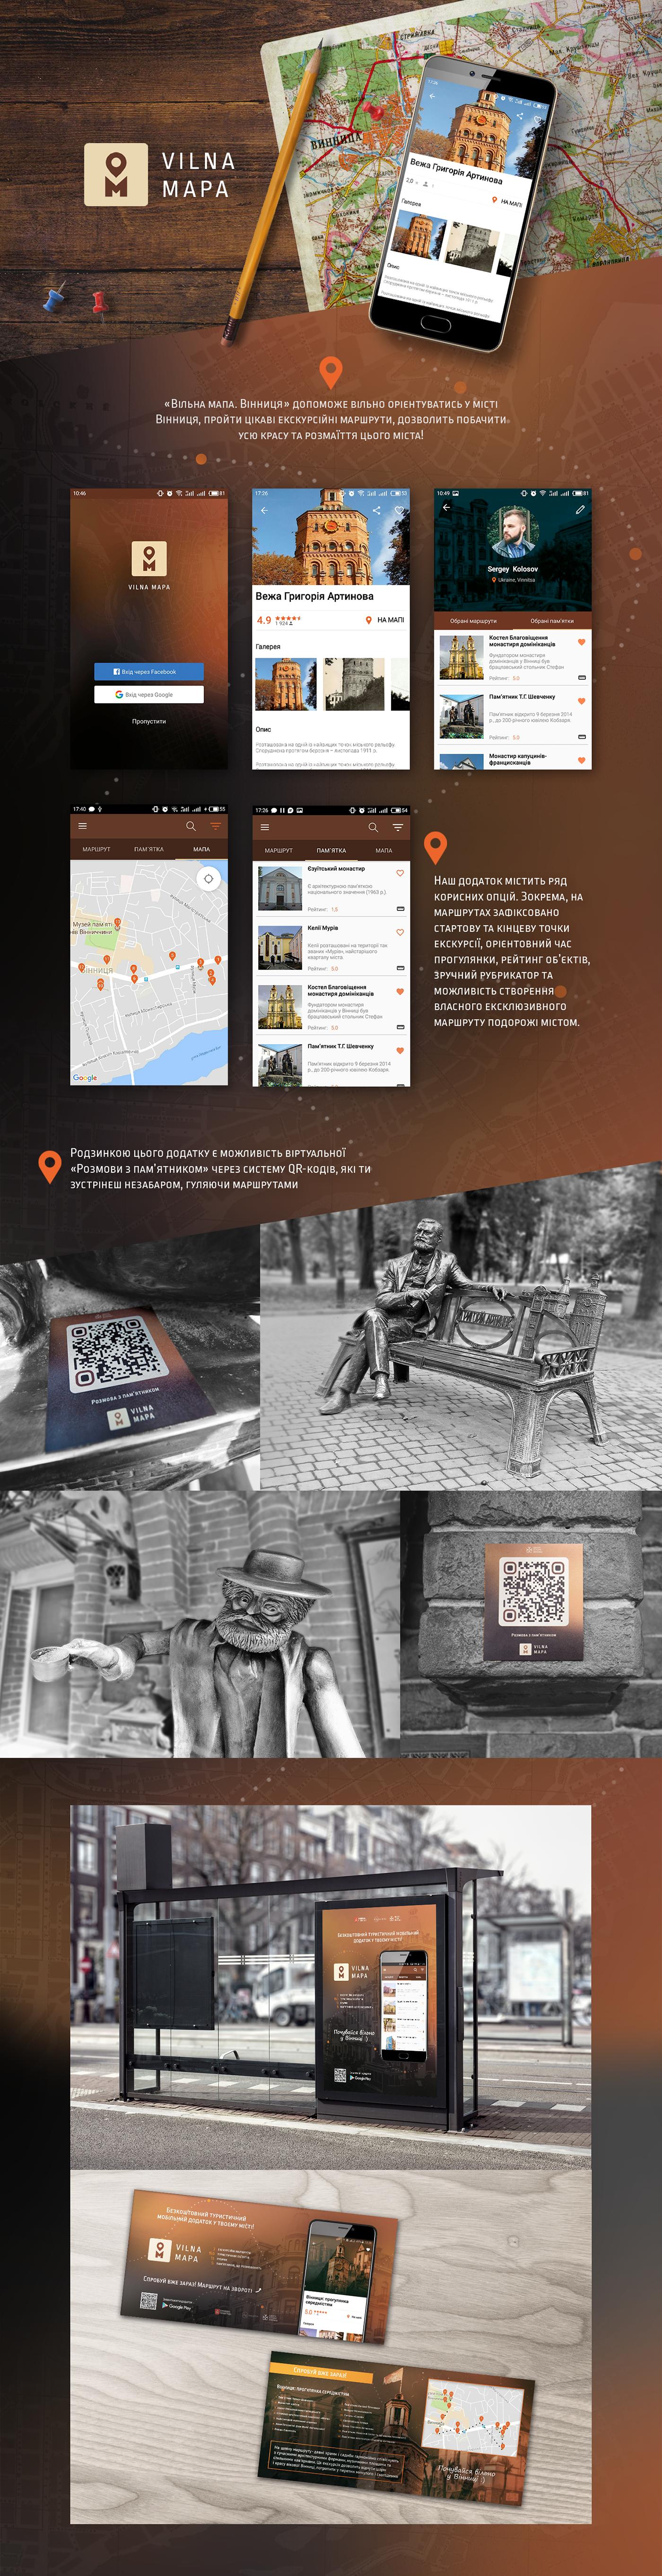 application map tourism app mobile